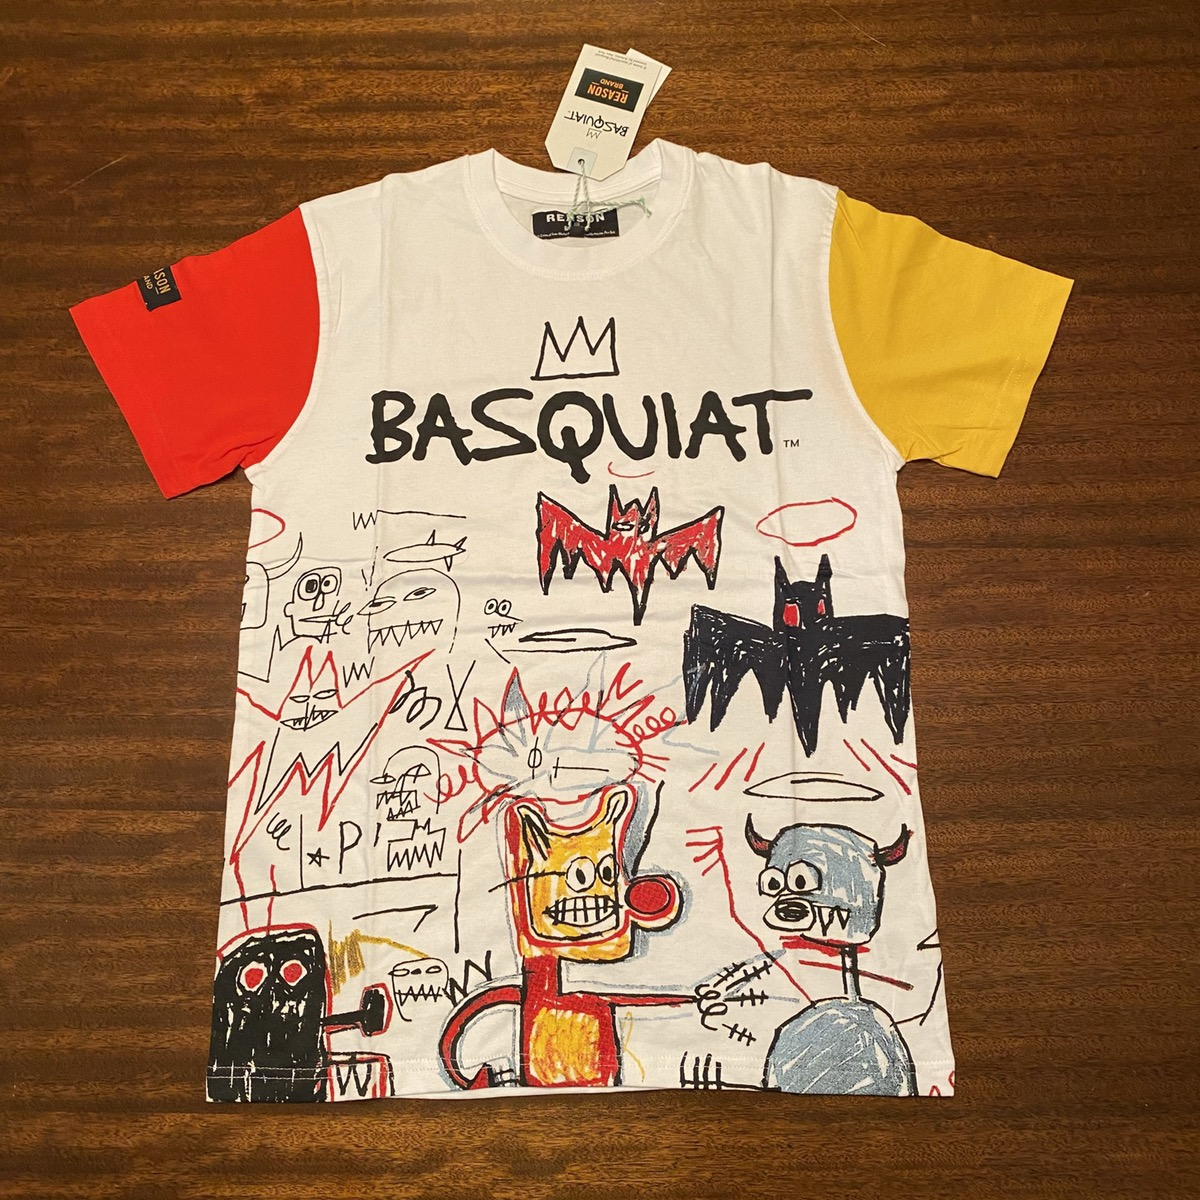 New JEAN-MICHEL BASQUIAT-untitled 1985-Regular Black T-Shirt Clothing